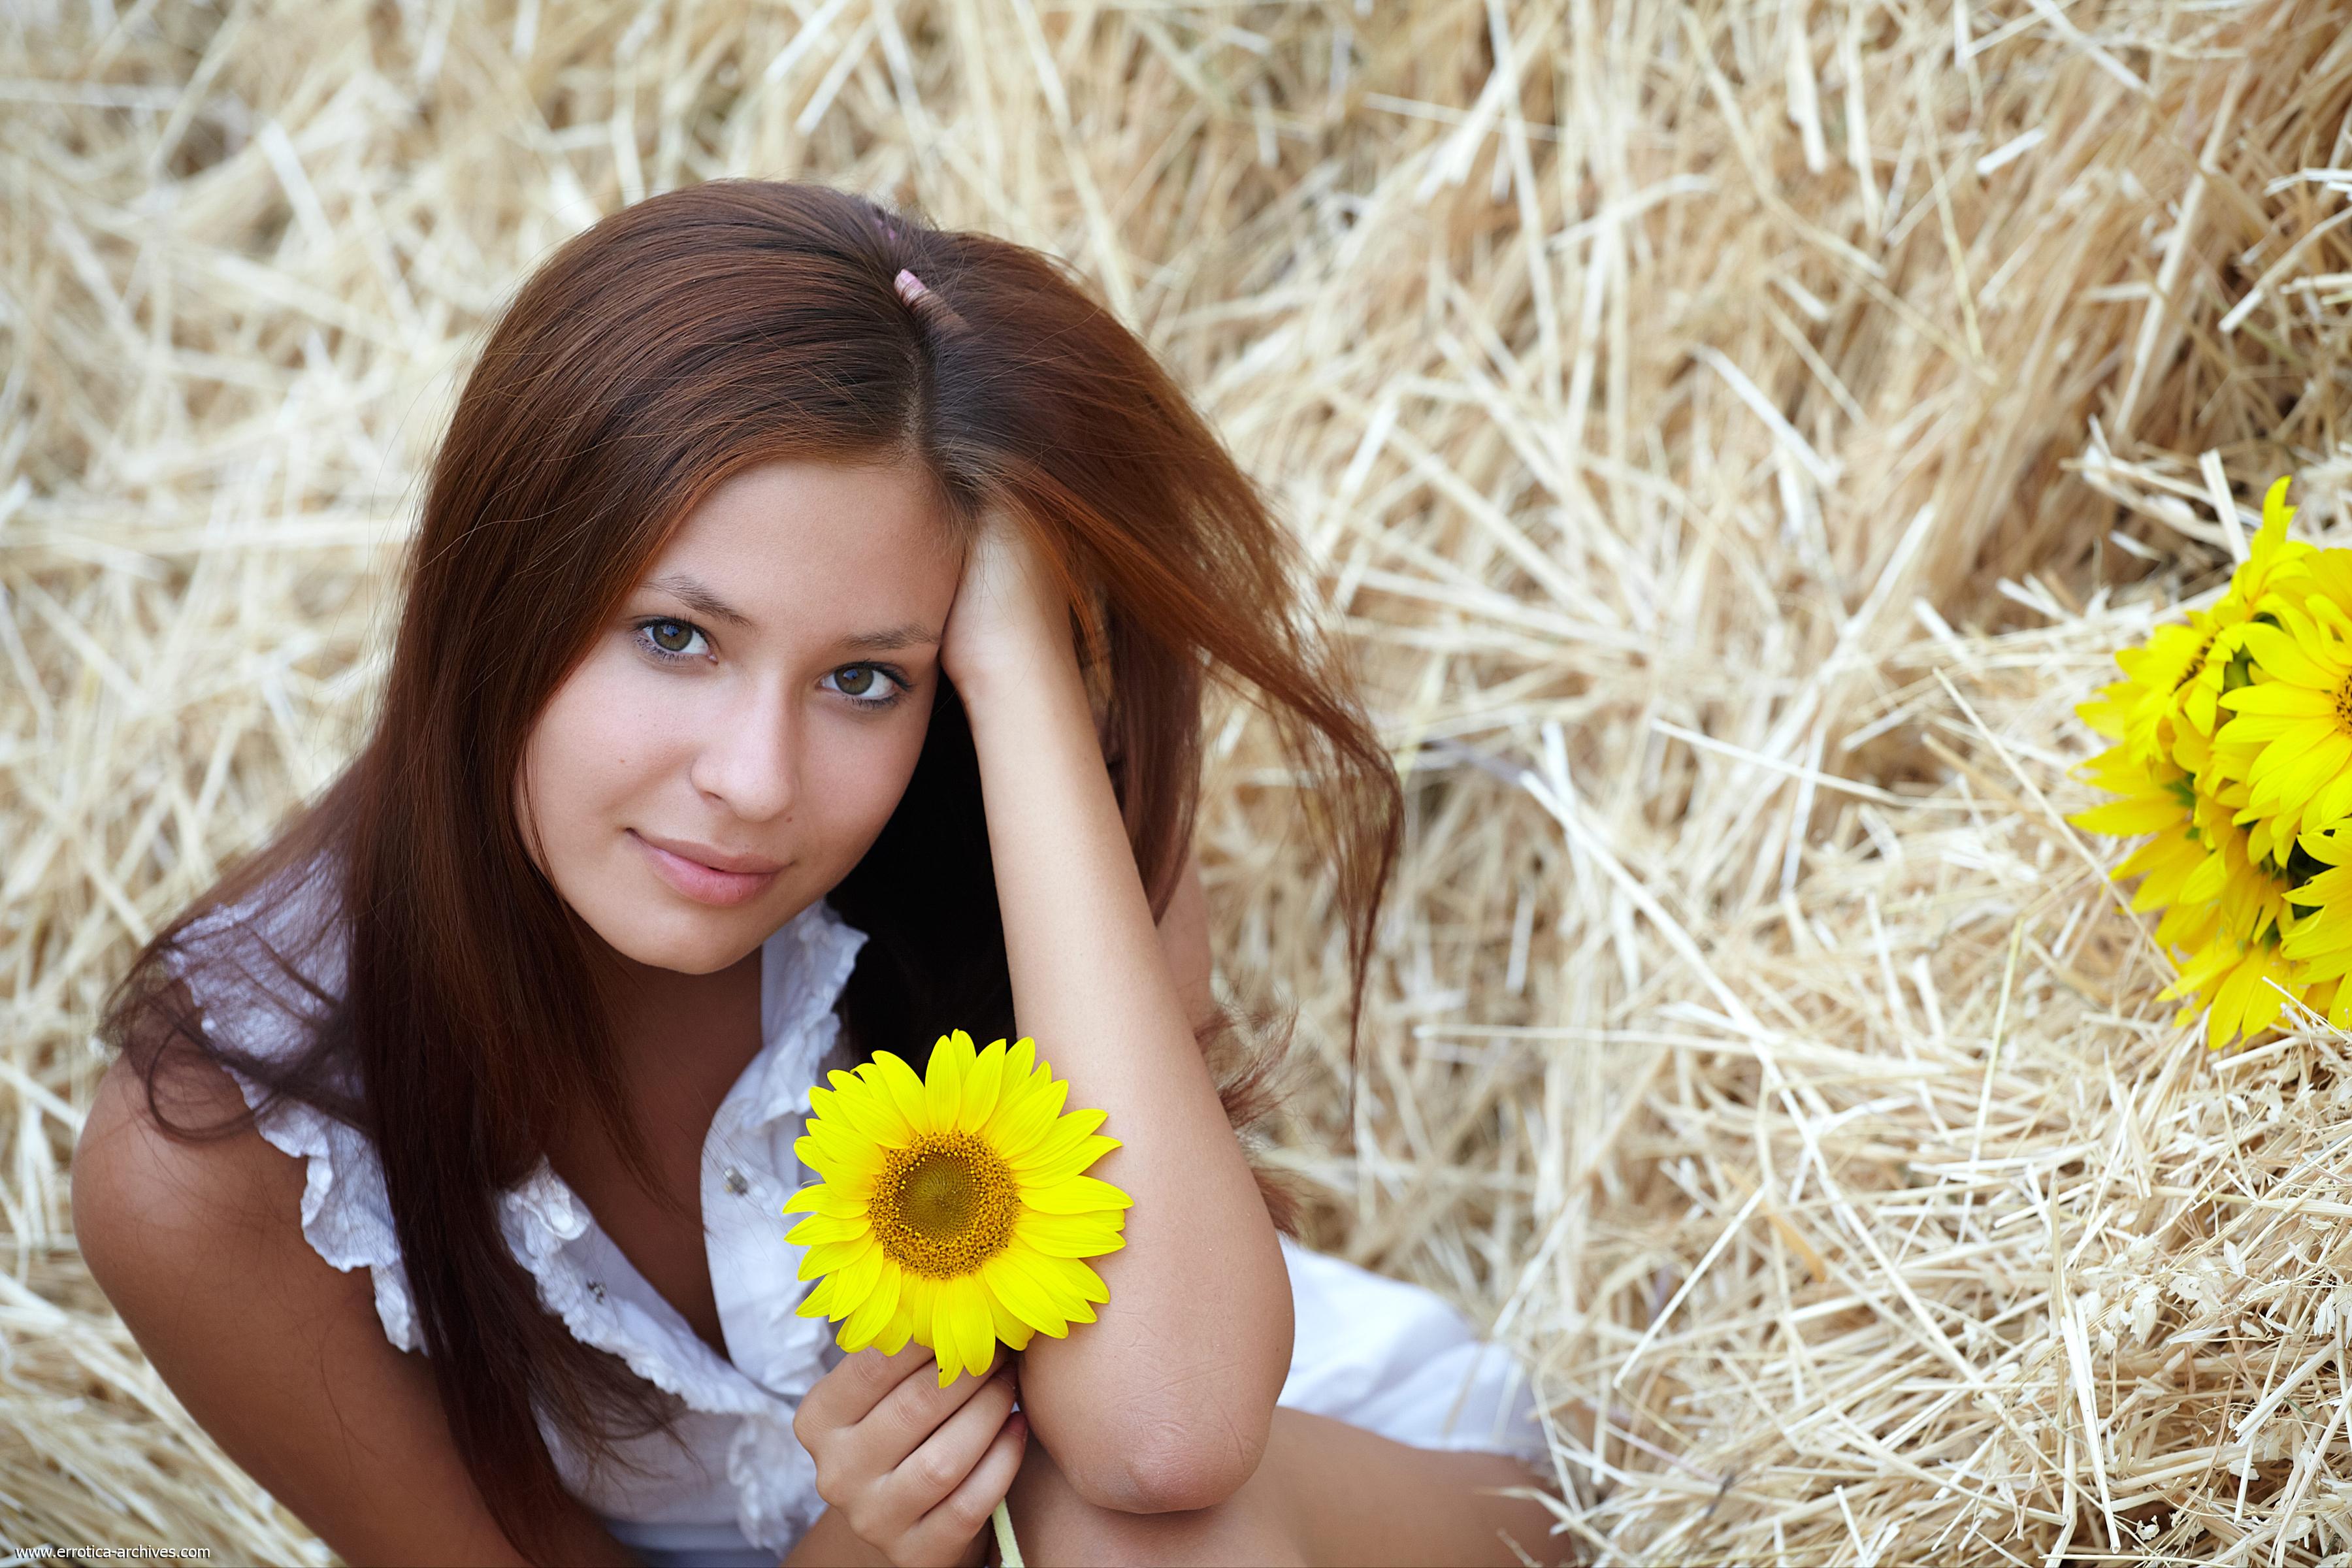 Фото в деревне для девушек